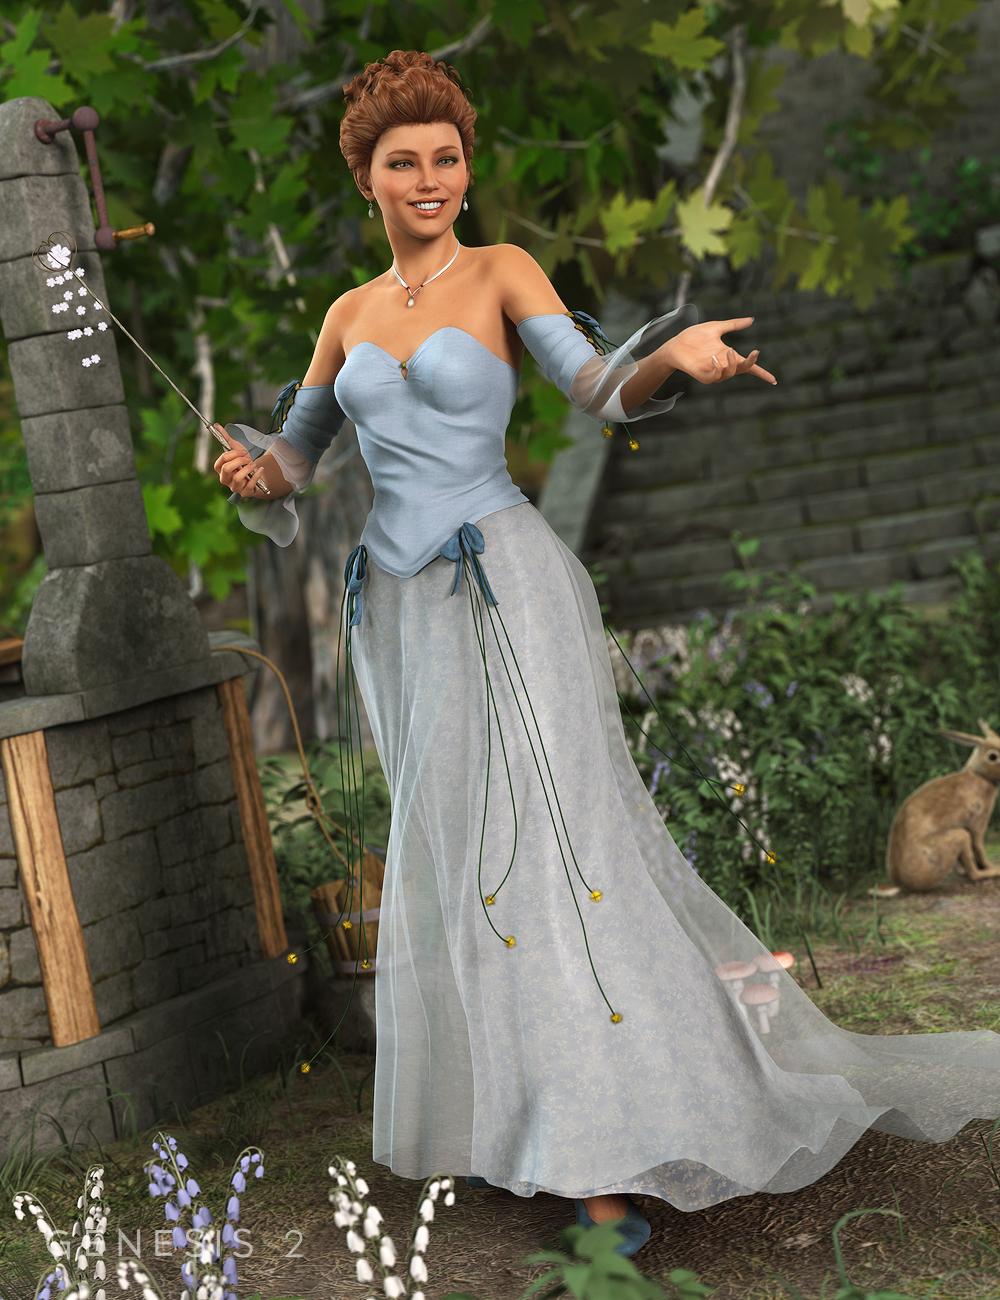 Fayre for Genesis Female(s) by: Ravenhair, 3D Models by Daz 3D